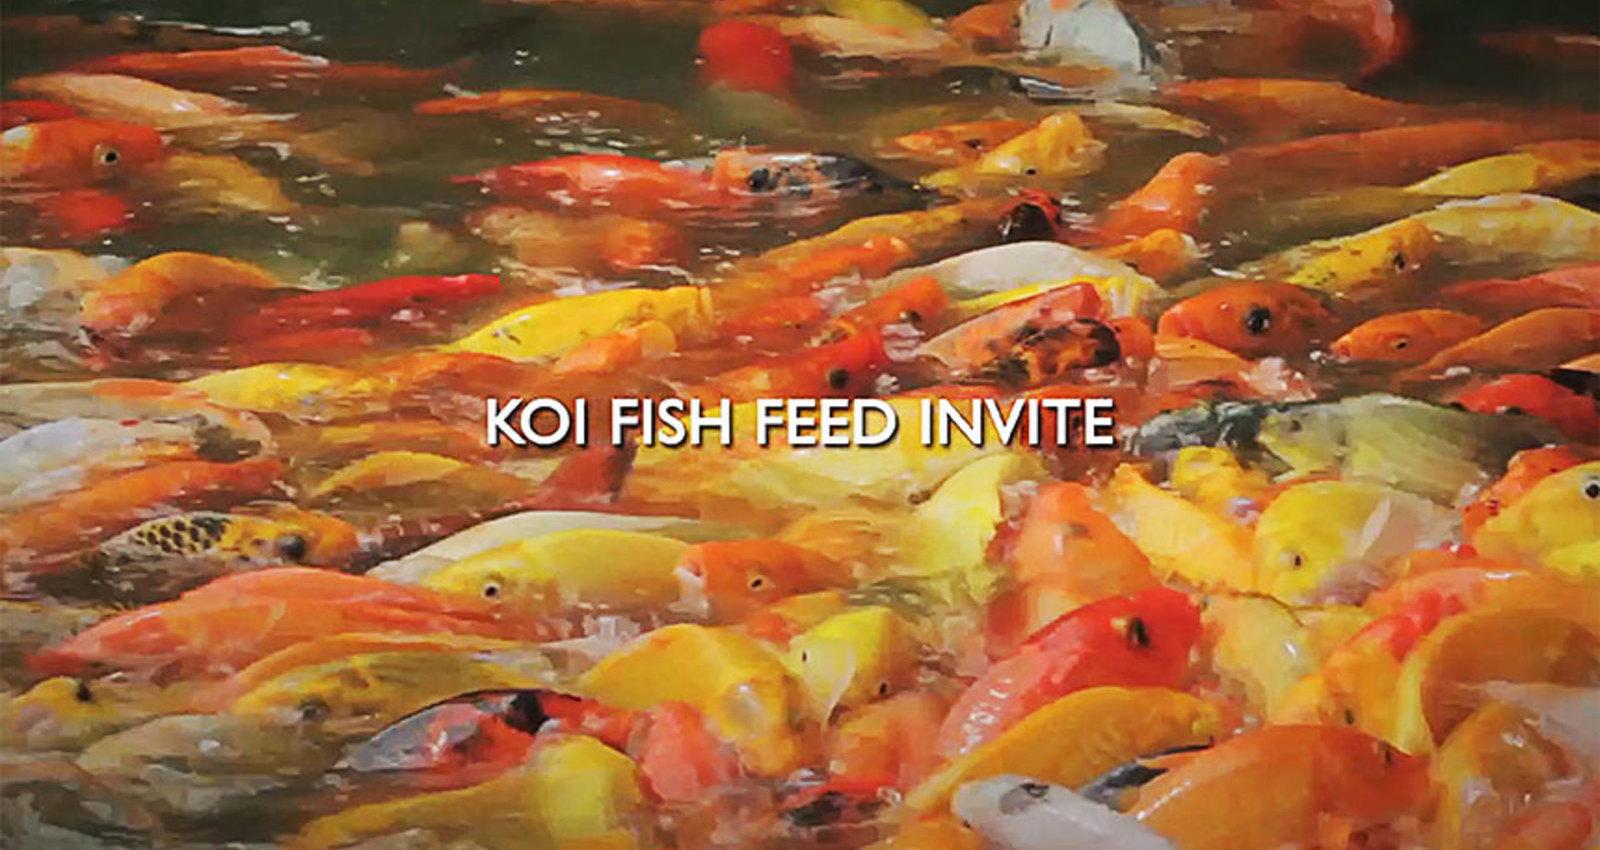 Koi Fish Feed Invite